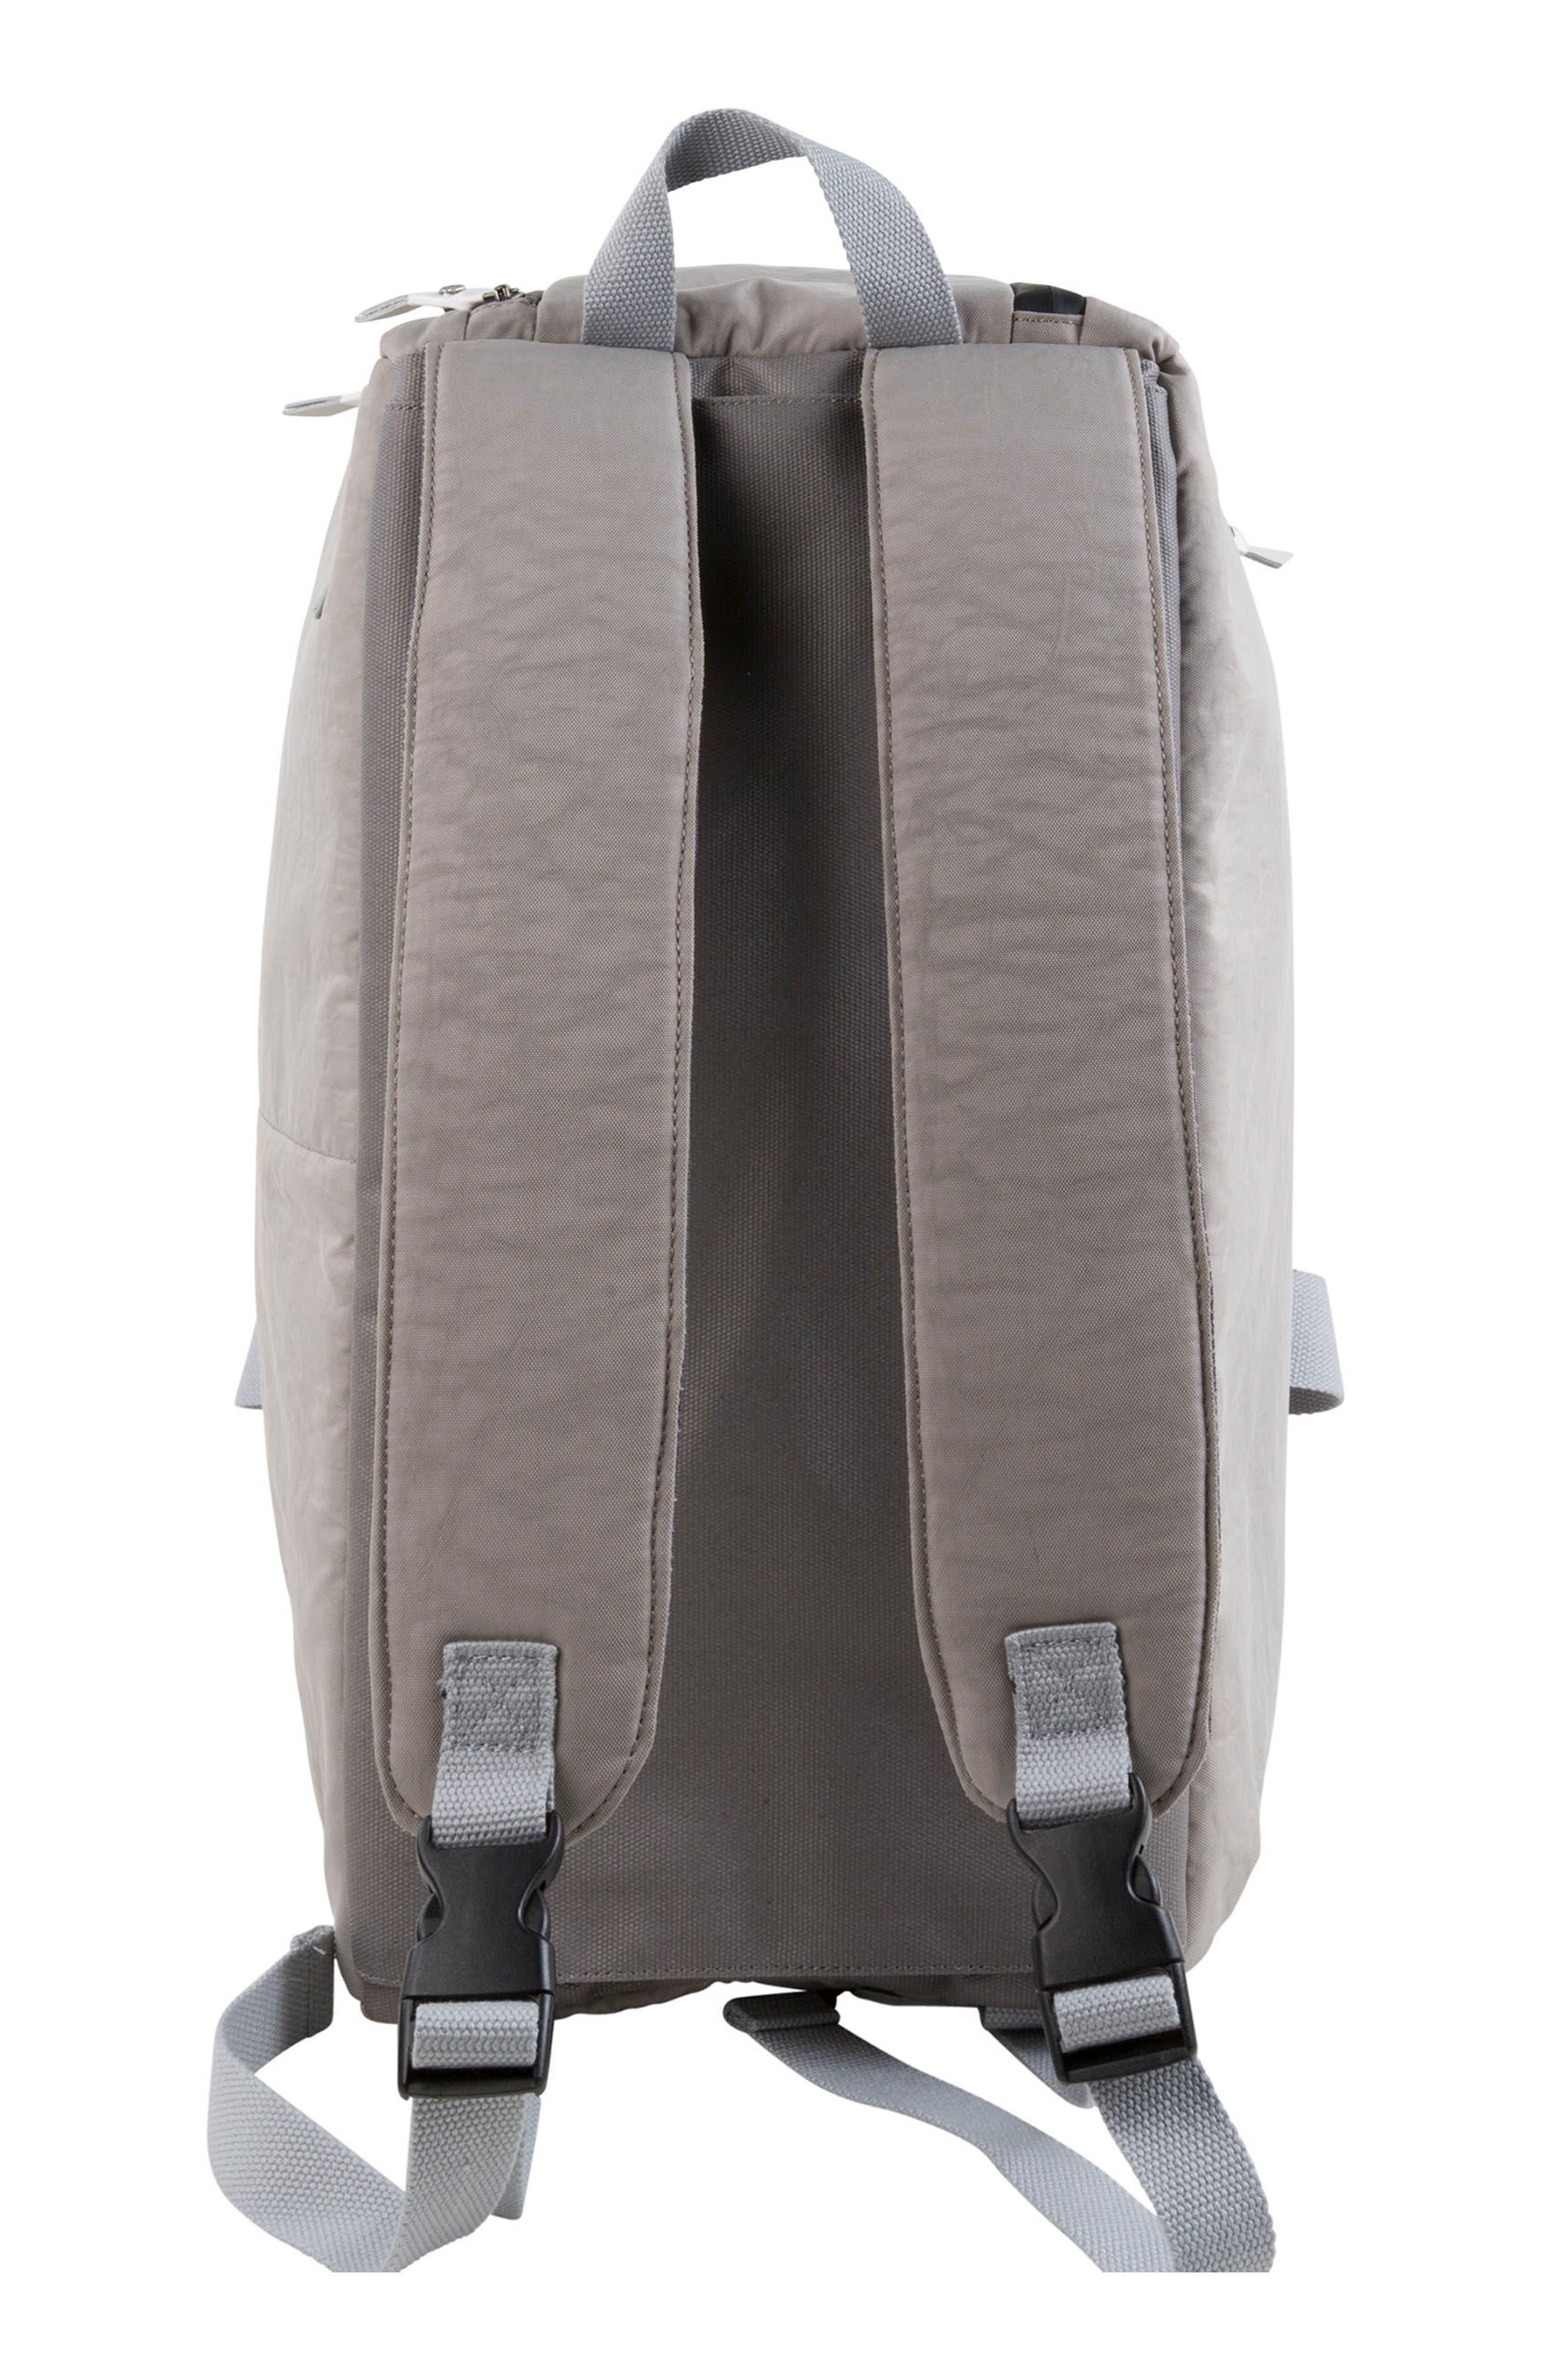 Calibre Convertible Duffel Bag,                             Alternate thumbnail 6, color,                             Strata Grey